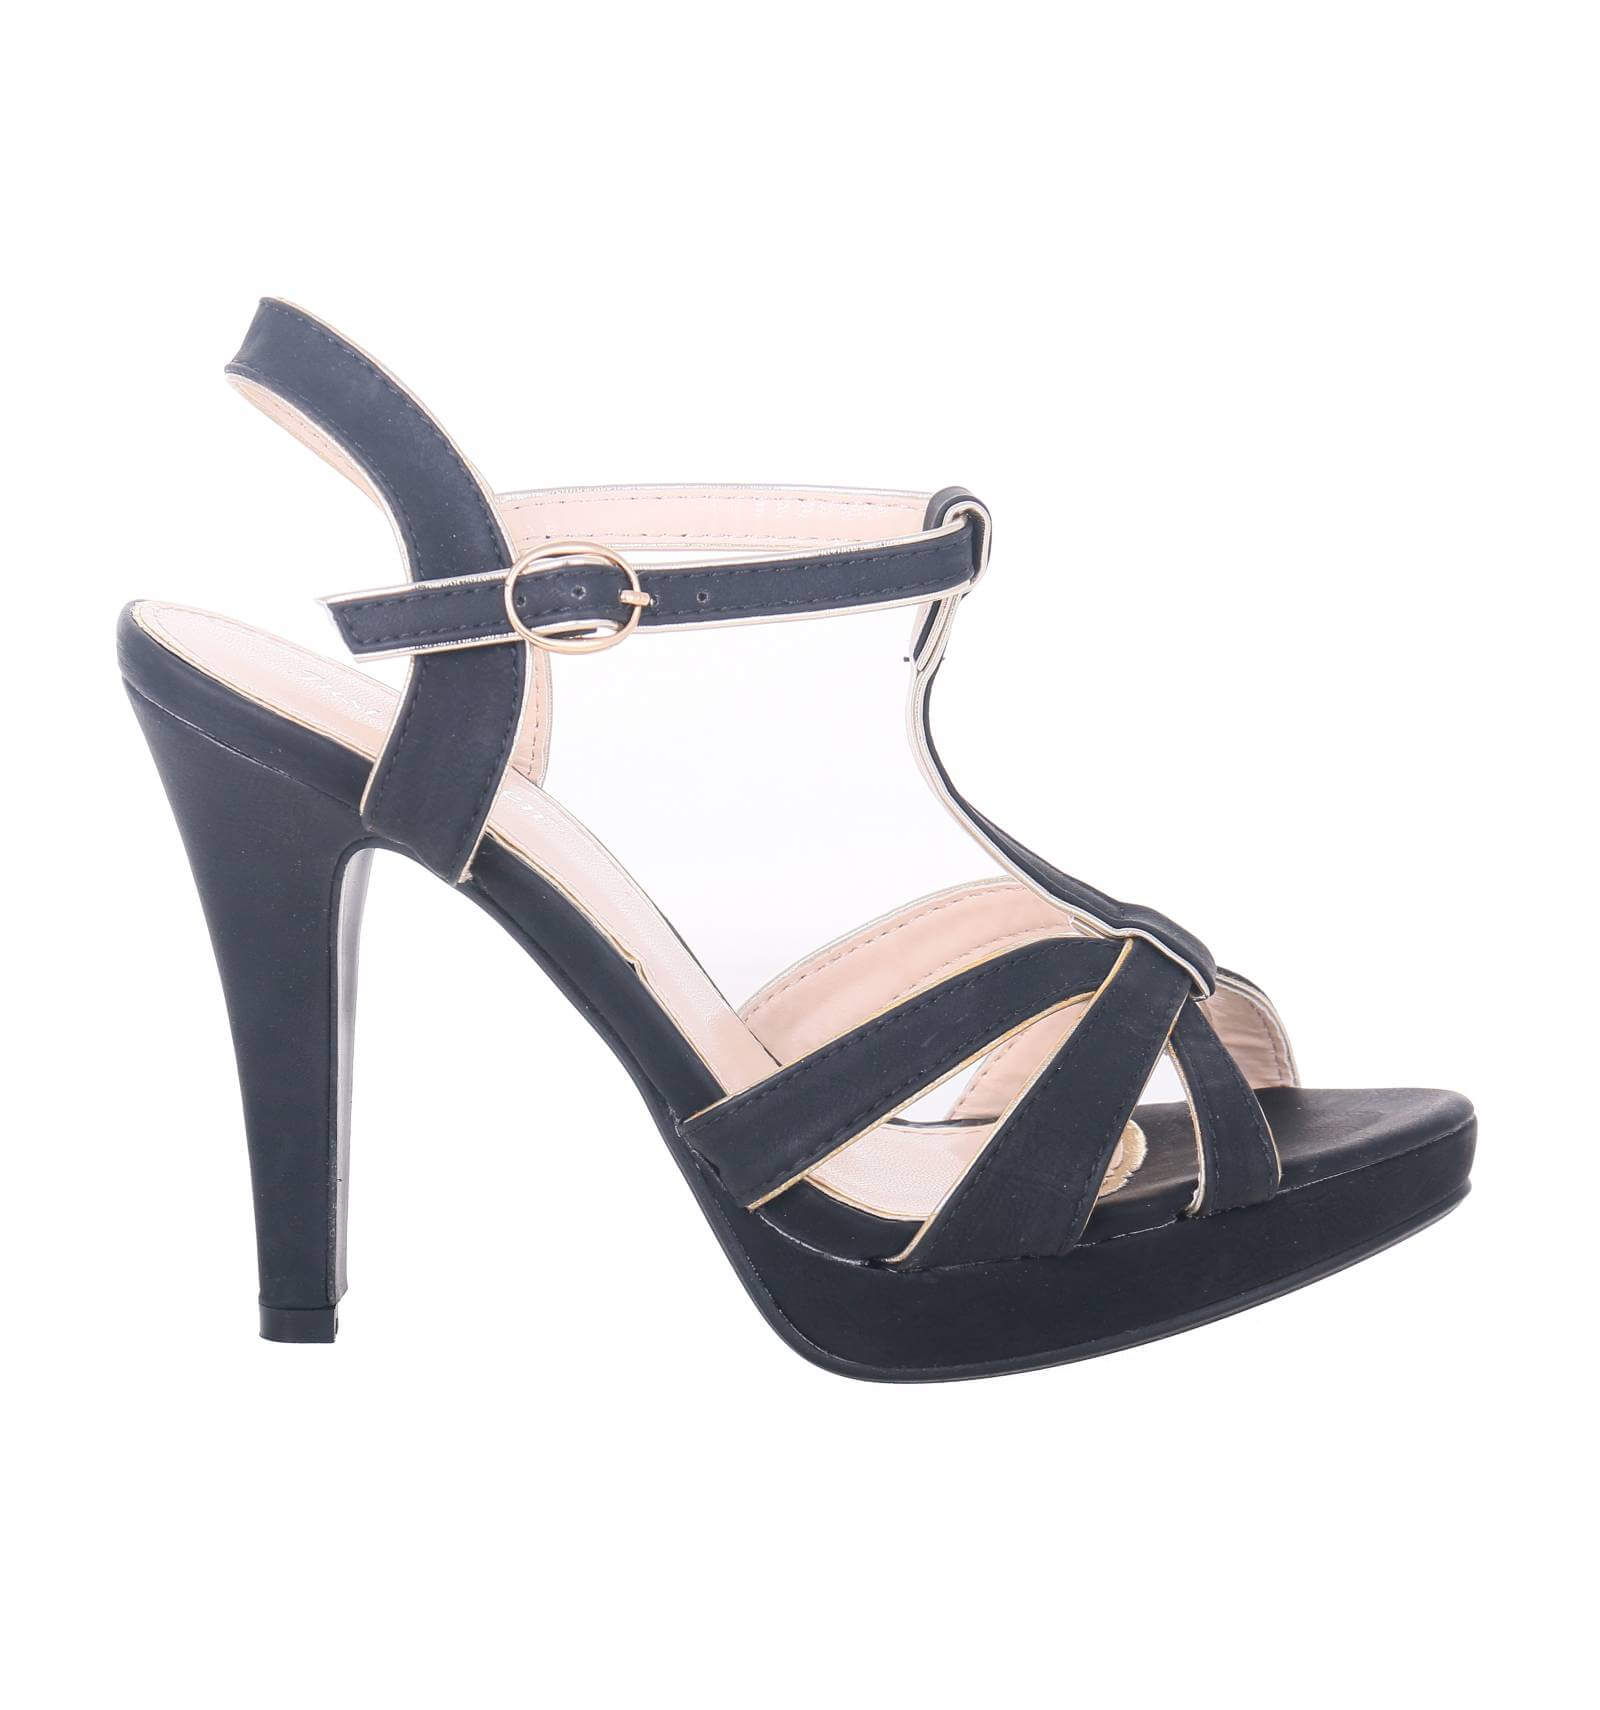 sandales talons hauts simili cuir bride noir. Black Bedroom Furniture Sets. Home Design Ideas